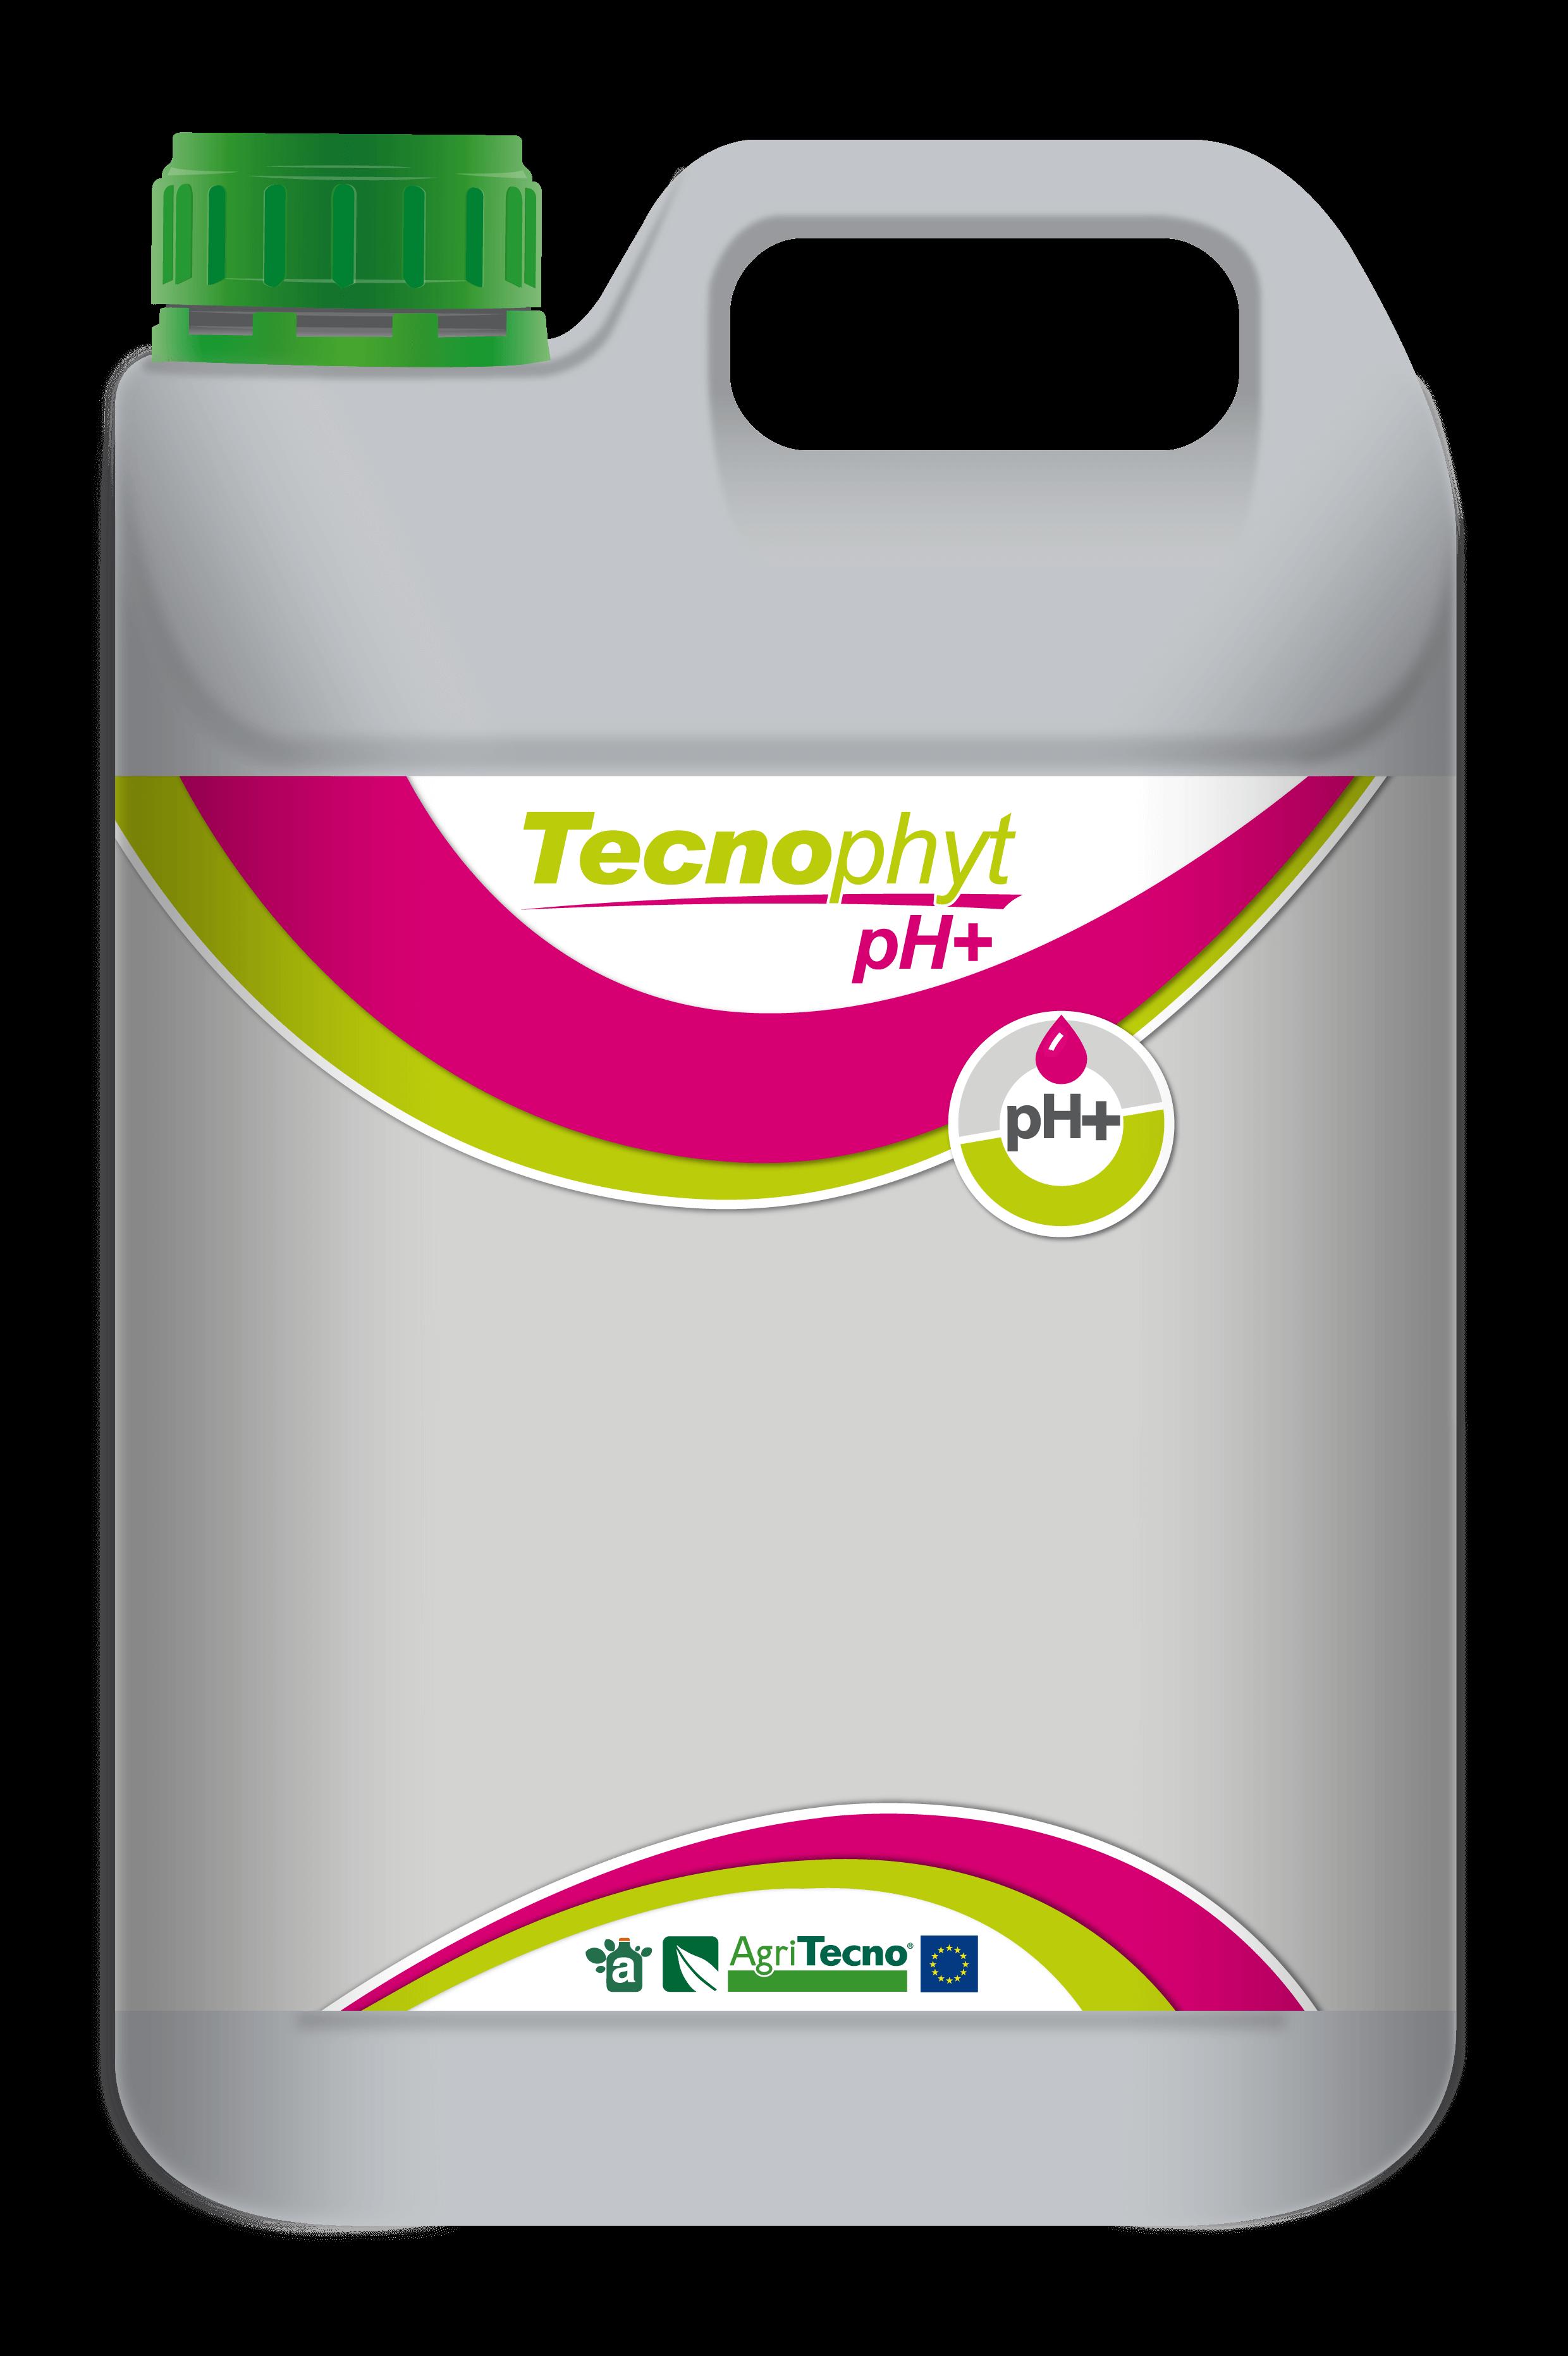 Tecnophyt pH+